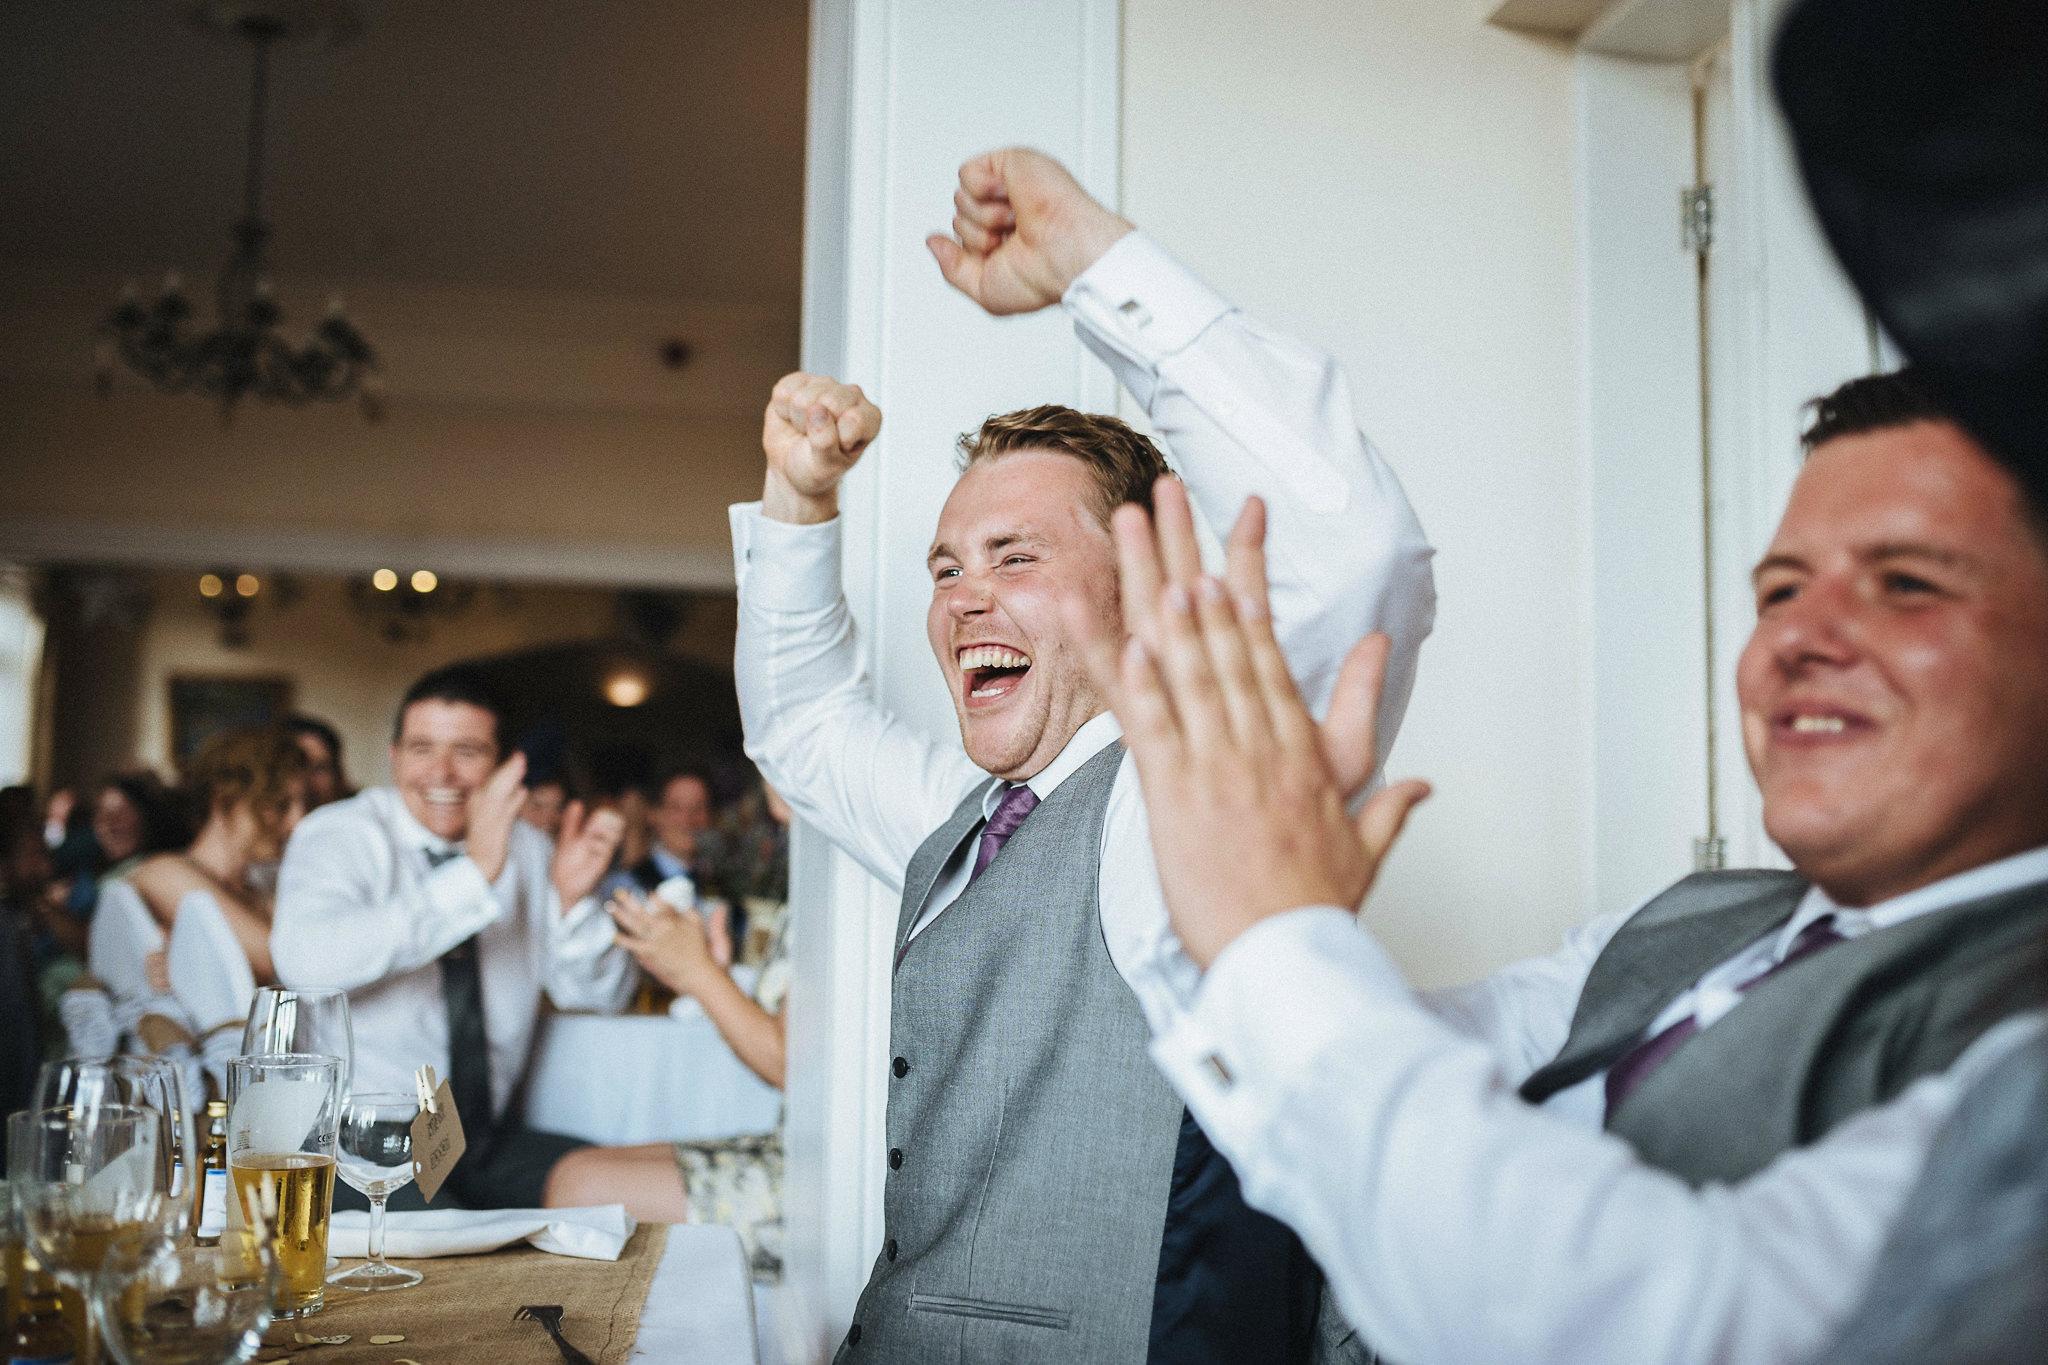 paul-marbrook-Caer-Llan-Wedding-Photographer-90080